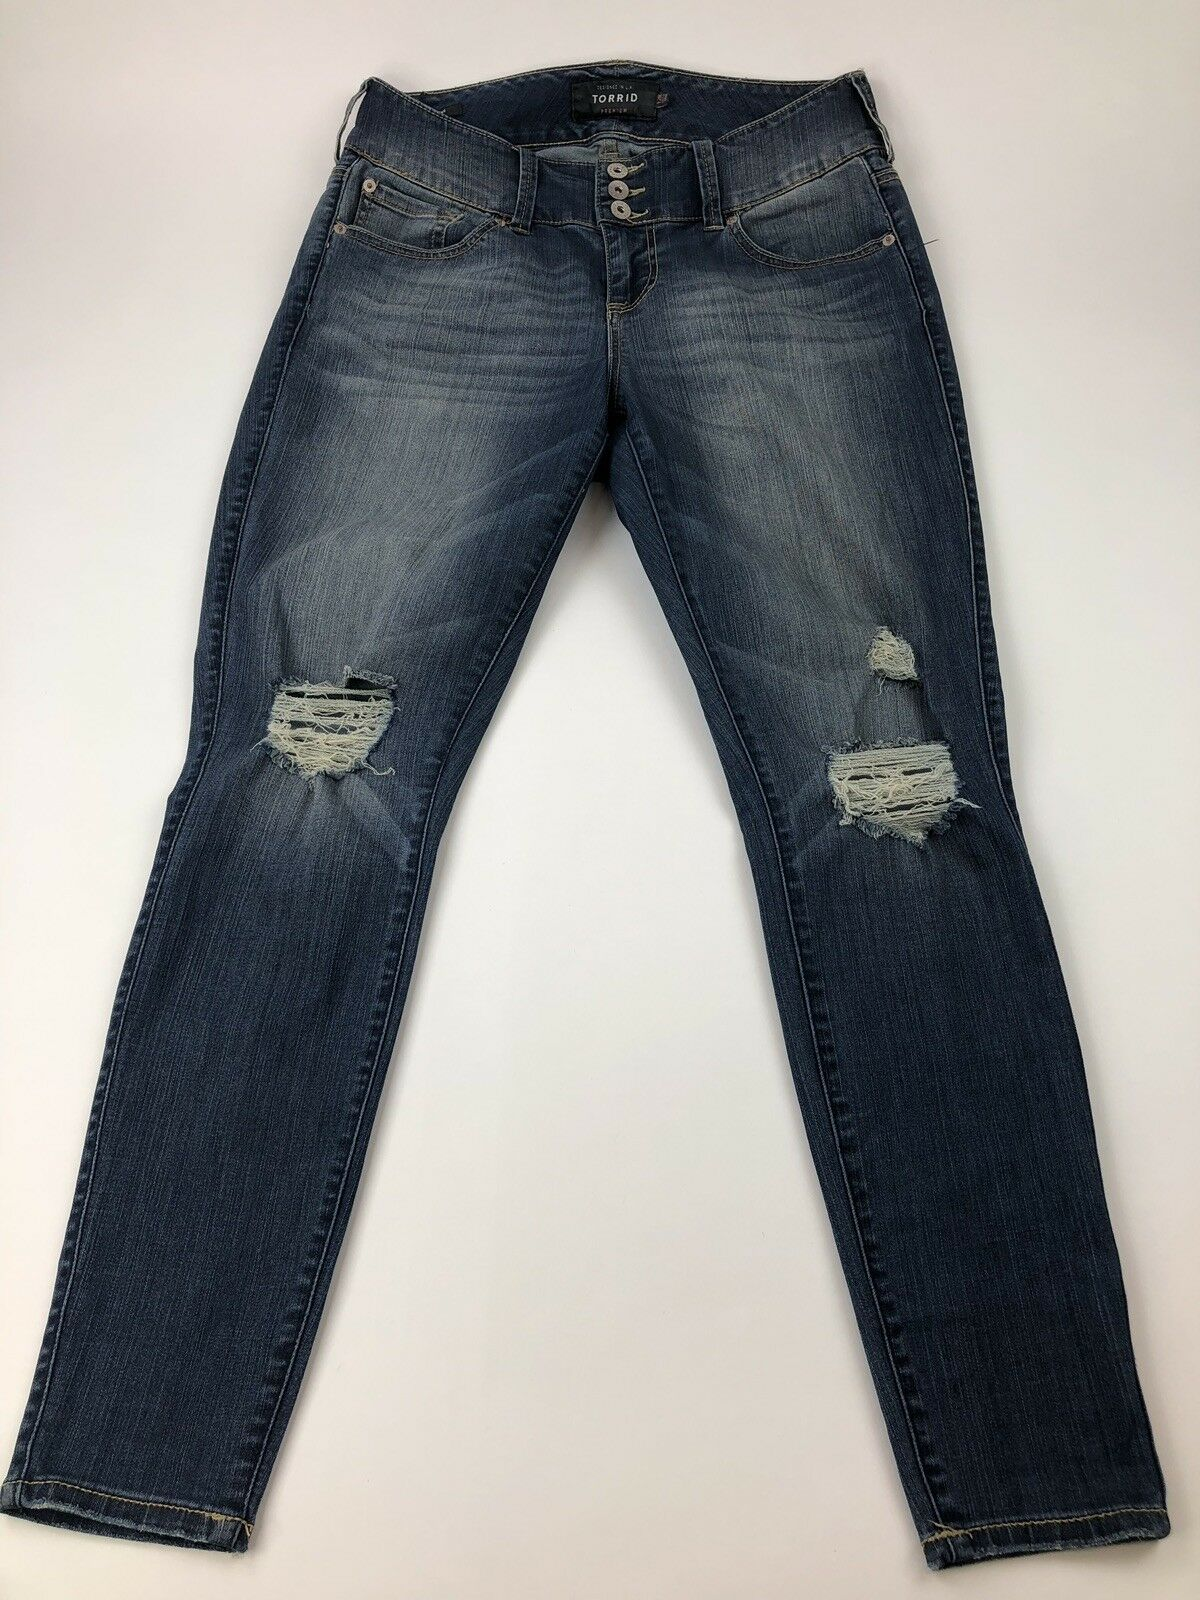 53ab49f6c9 Torrid Distressed Jegging Skinny Ankle Jeans Size 12R EUC Premium  ouablr7127-Jeans